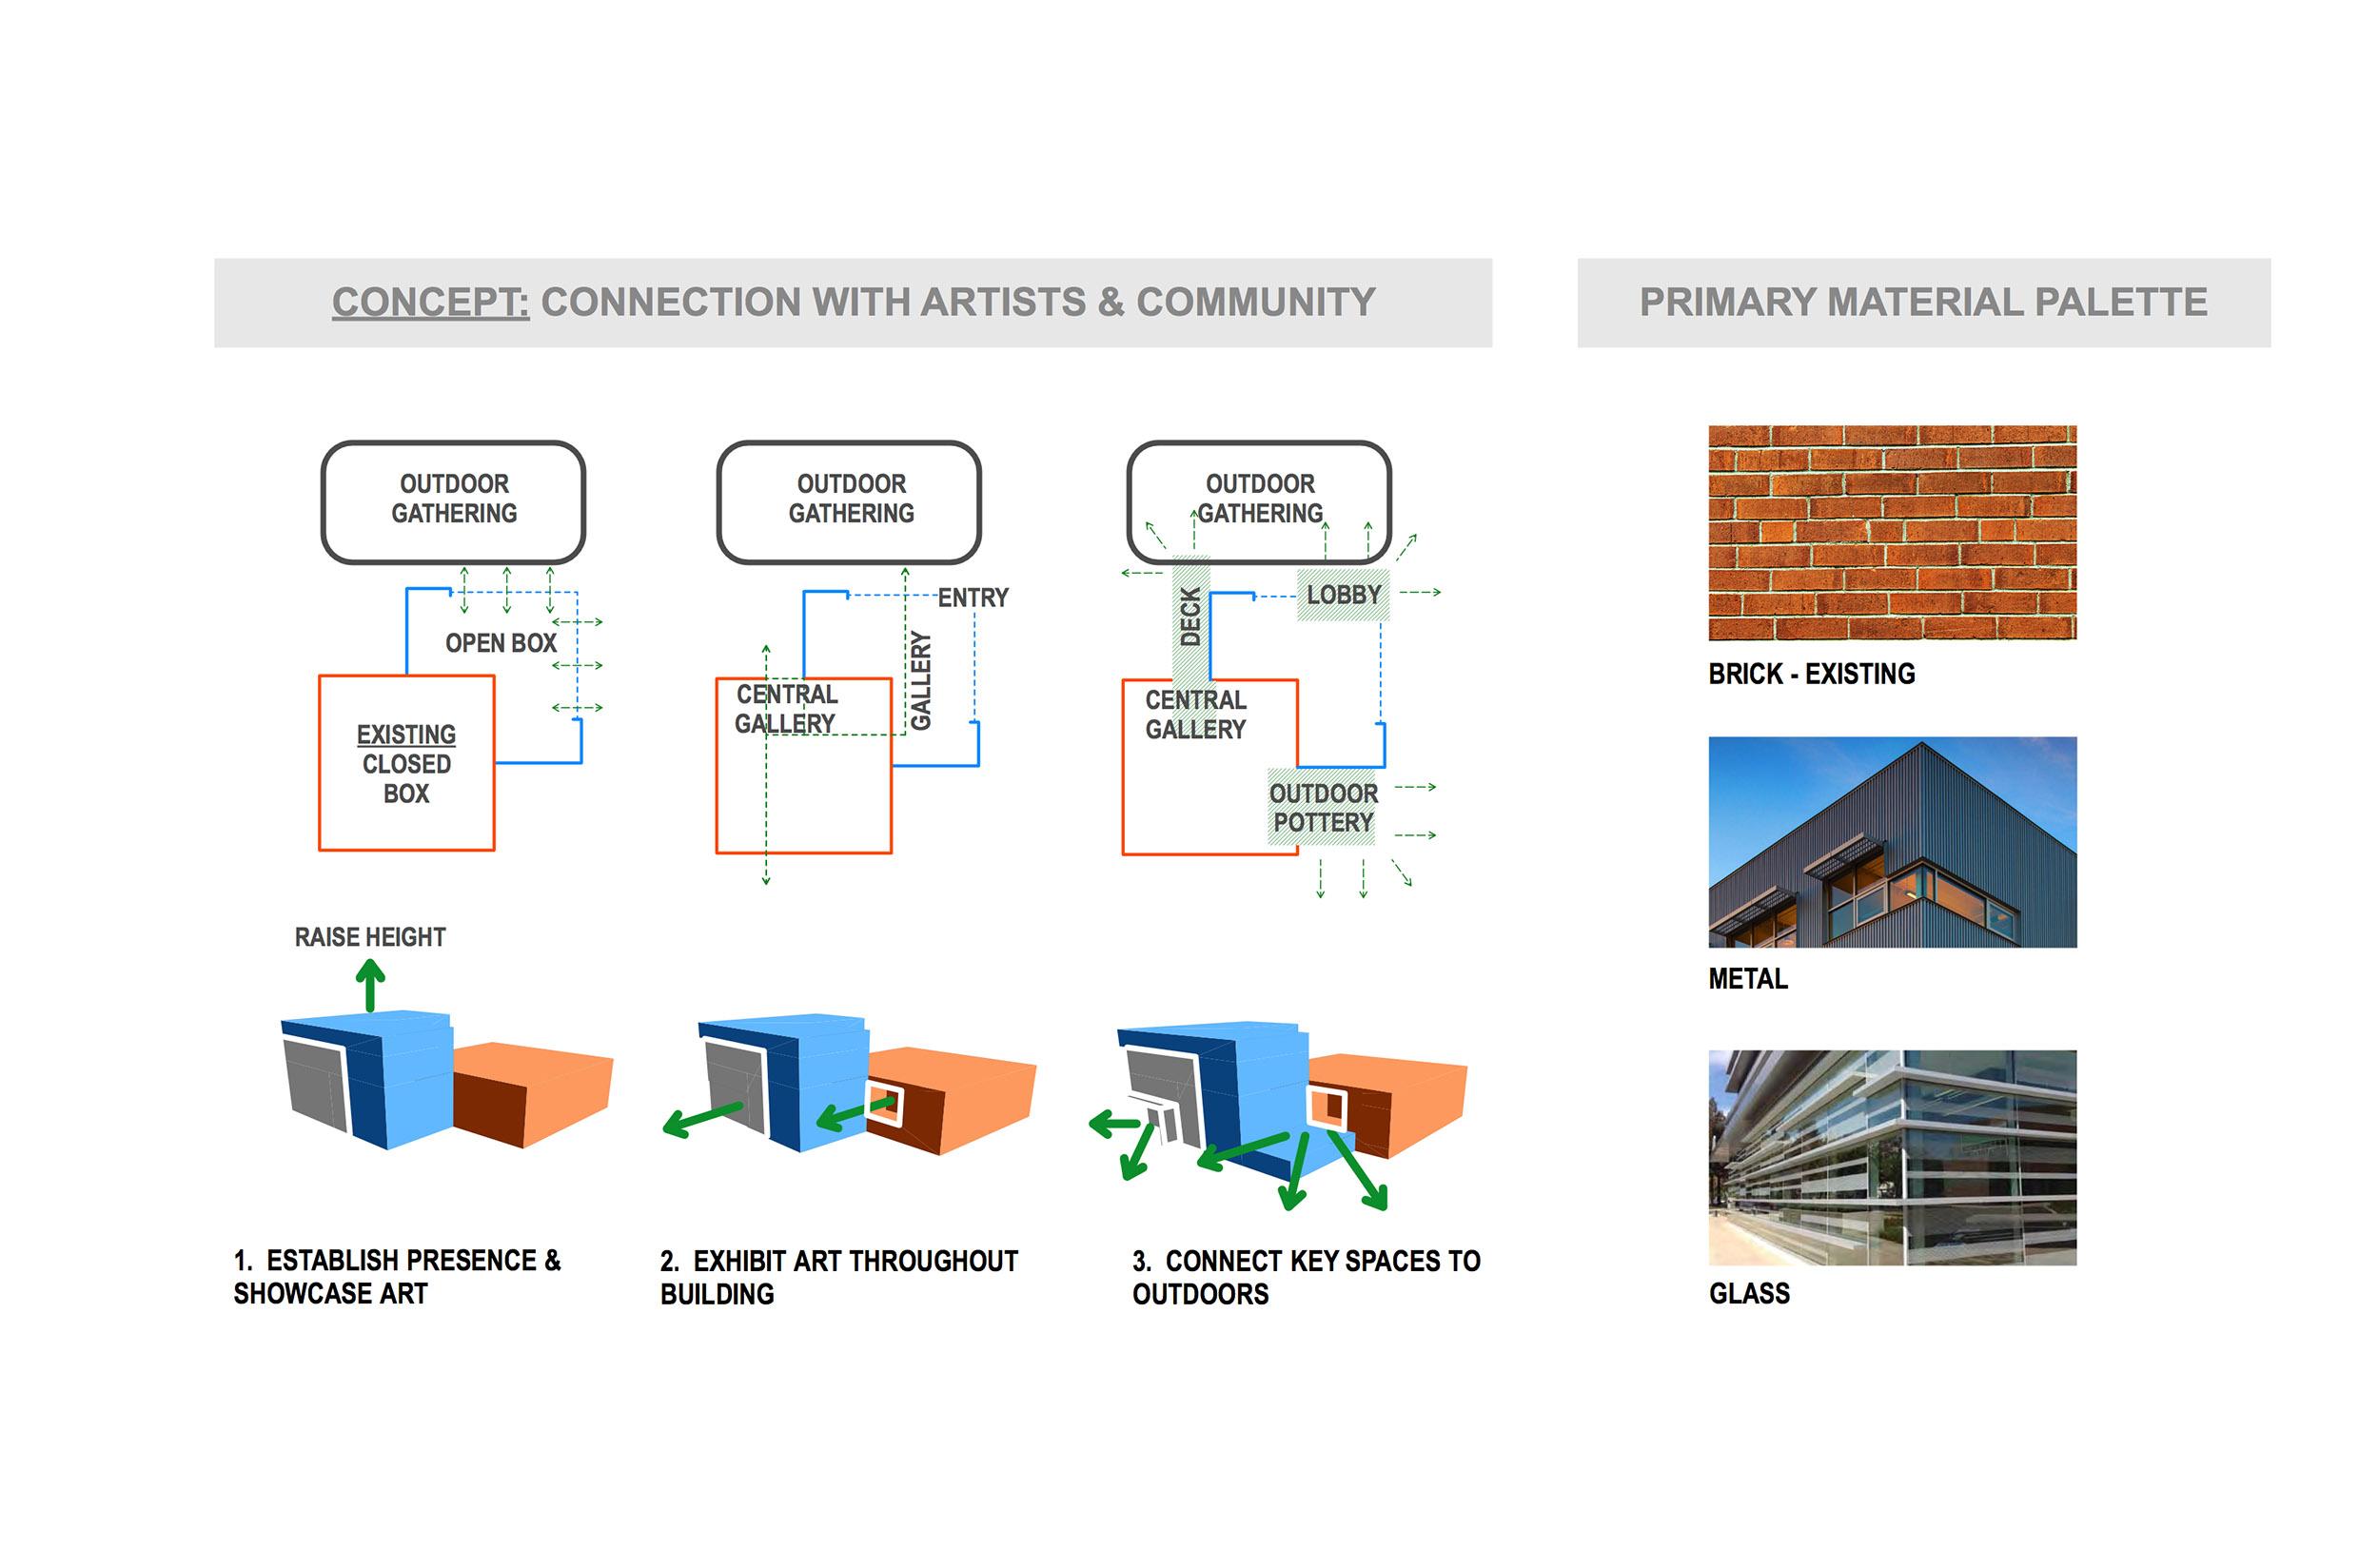 P-04L-Presentation - Concept LANDSCAPE_REDUCED.jpg